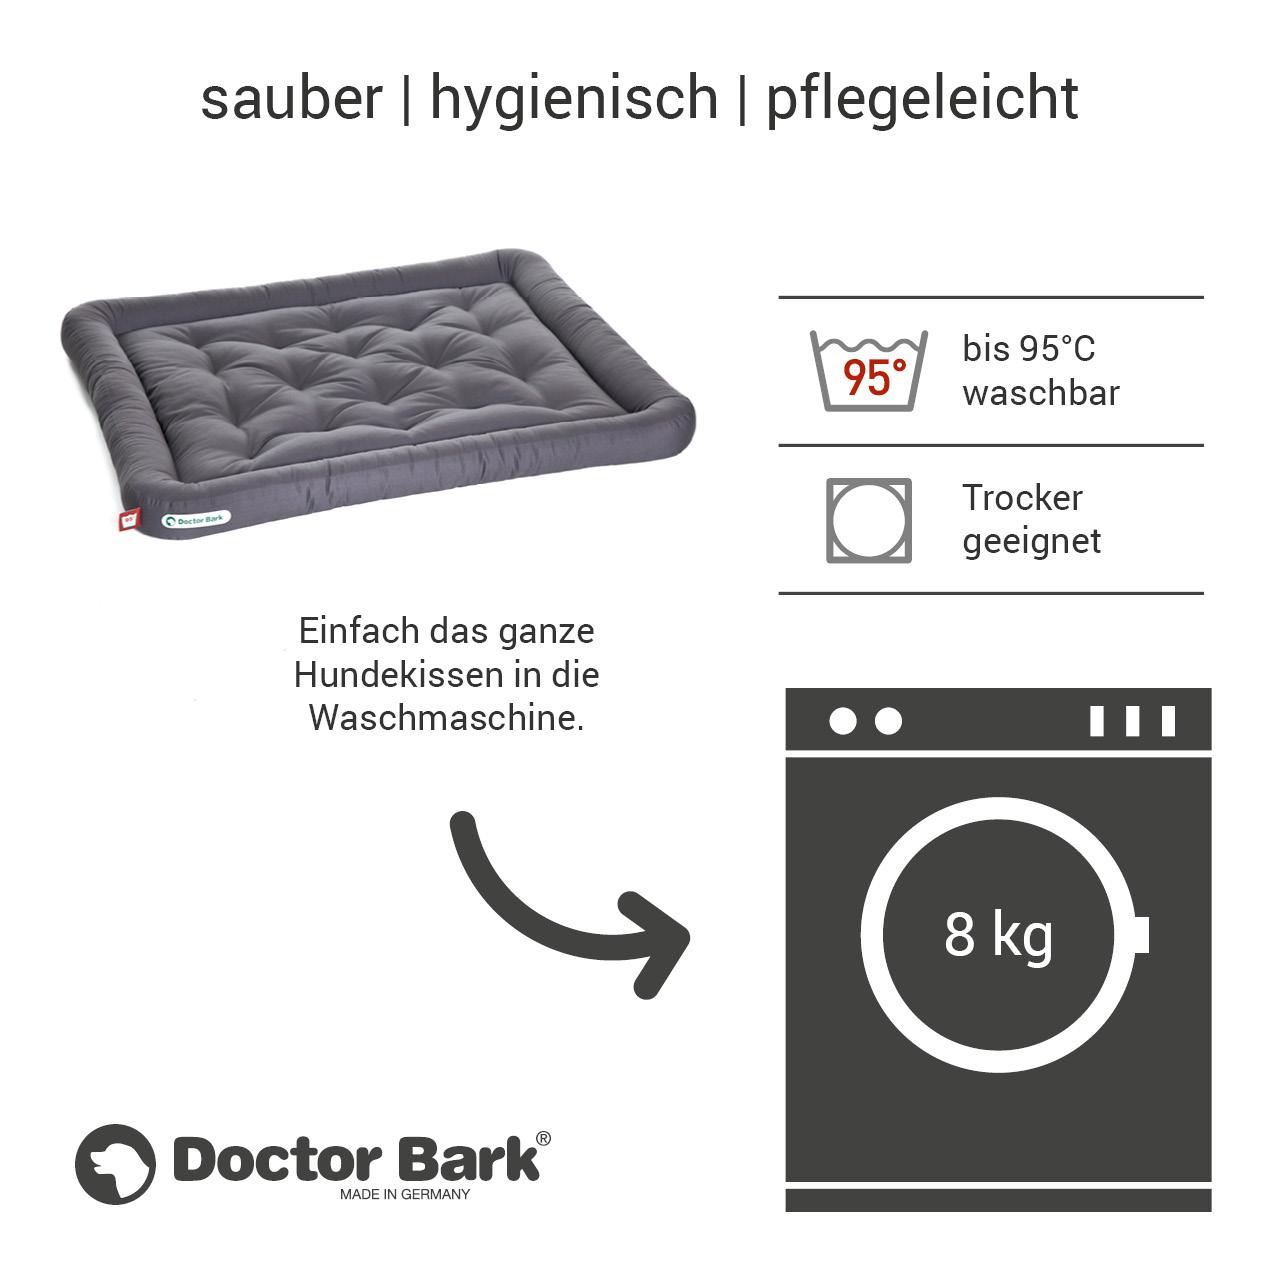 Lounge-Hundekissen / Hundebett orthopädisch Doctor Bark waschbar grau - Gr. XL